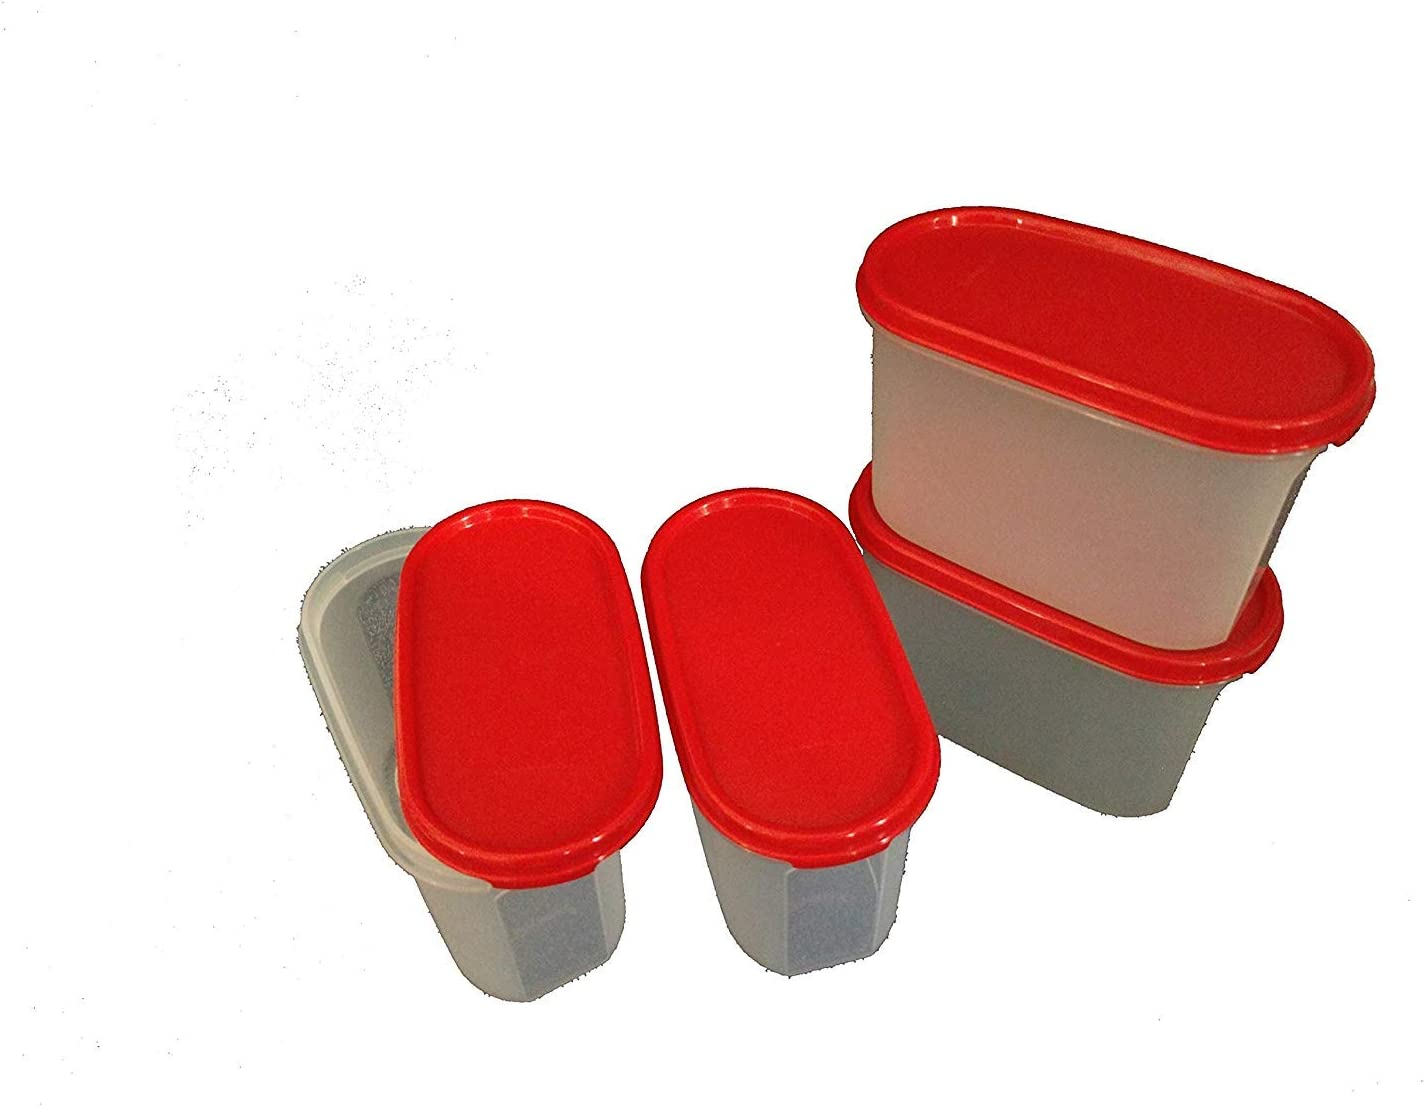 Tupin Deluxe Tupperware Modular Mate Oval 1.1 Container Li Set Plastic discount